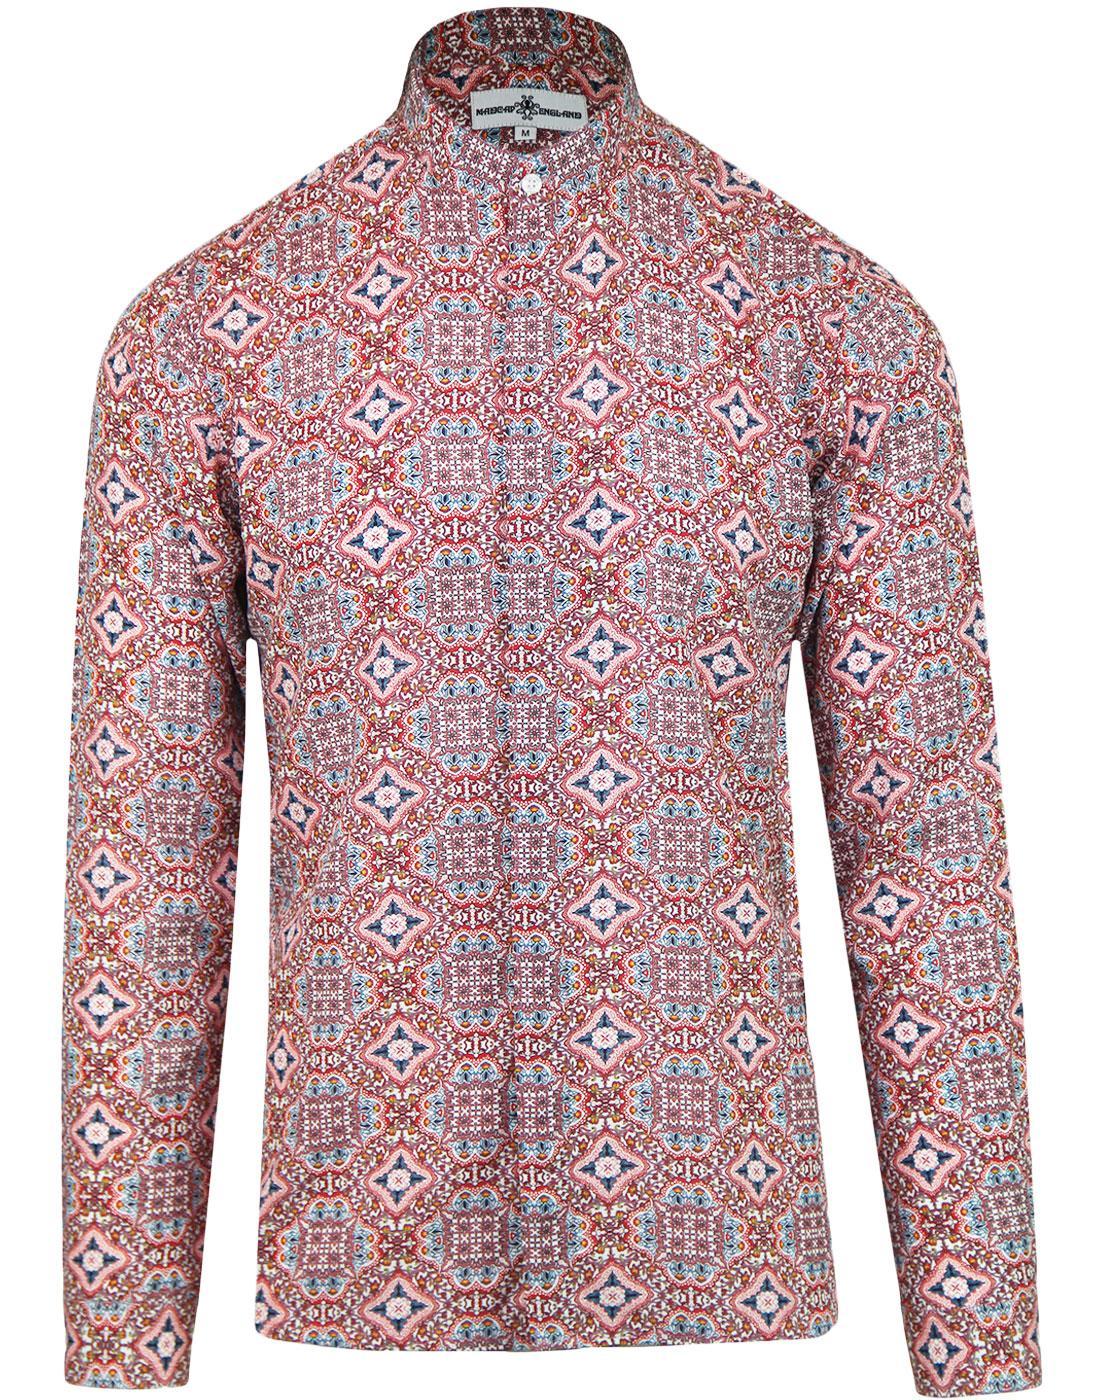 madcap england lotus 60s mod floral grandad shirt